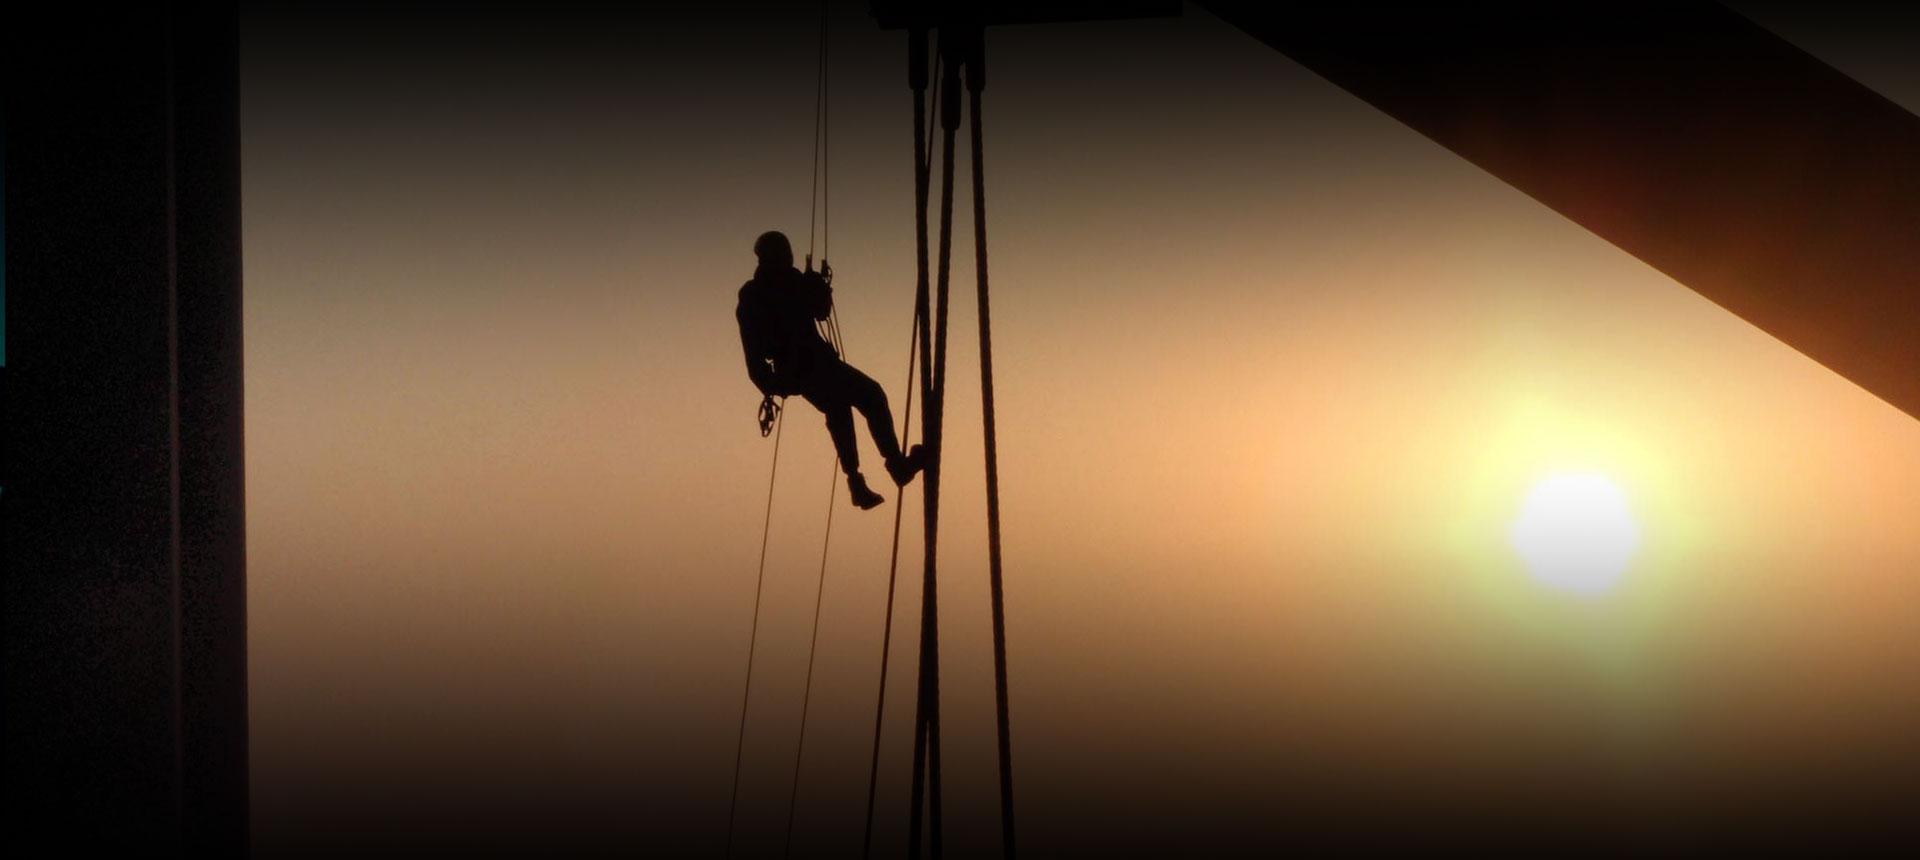 Shutterbug - Hot Air Balloon Sunset